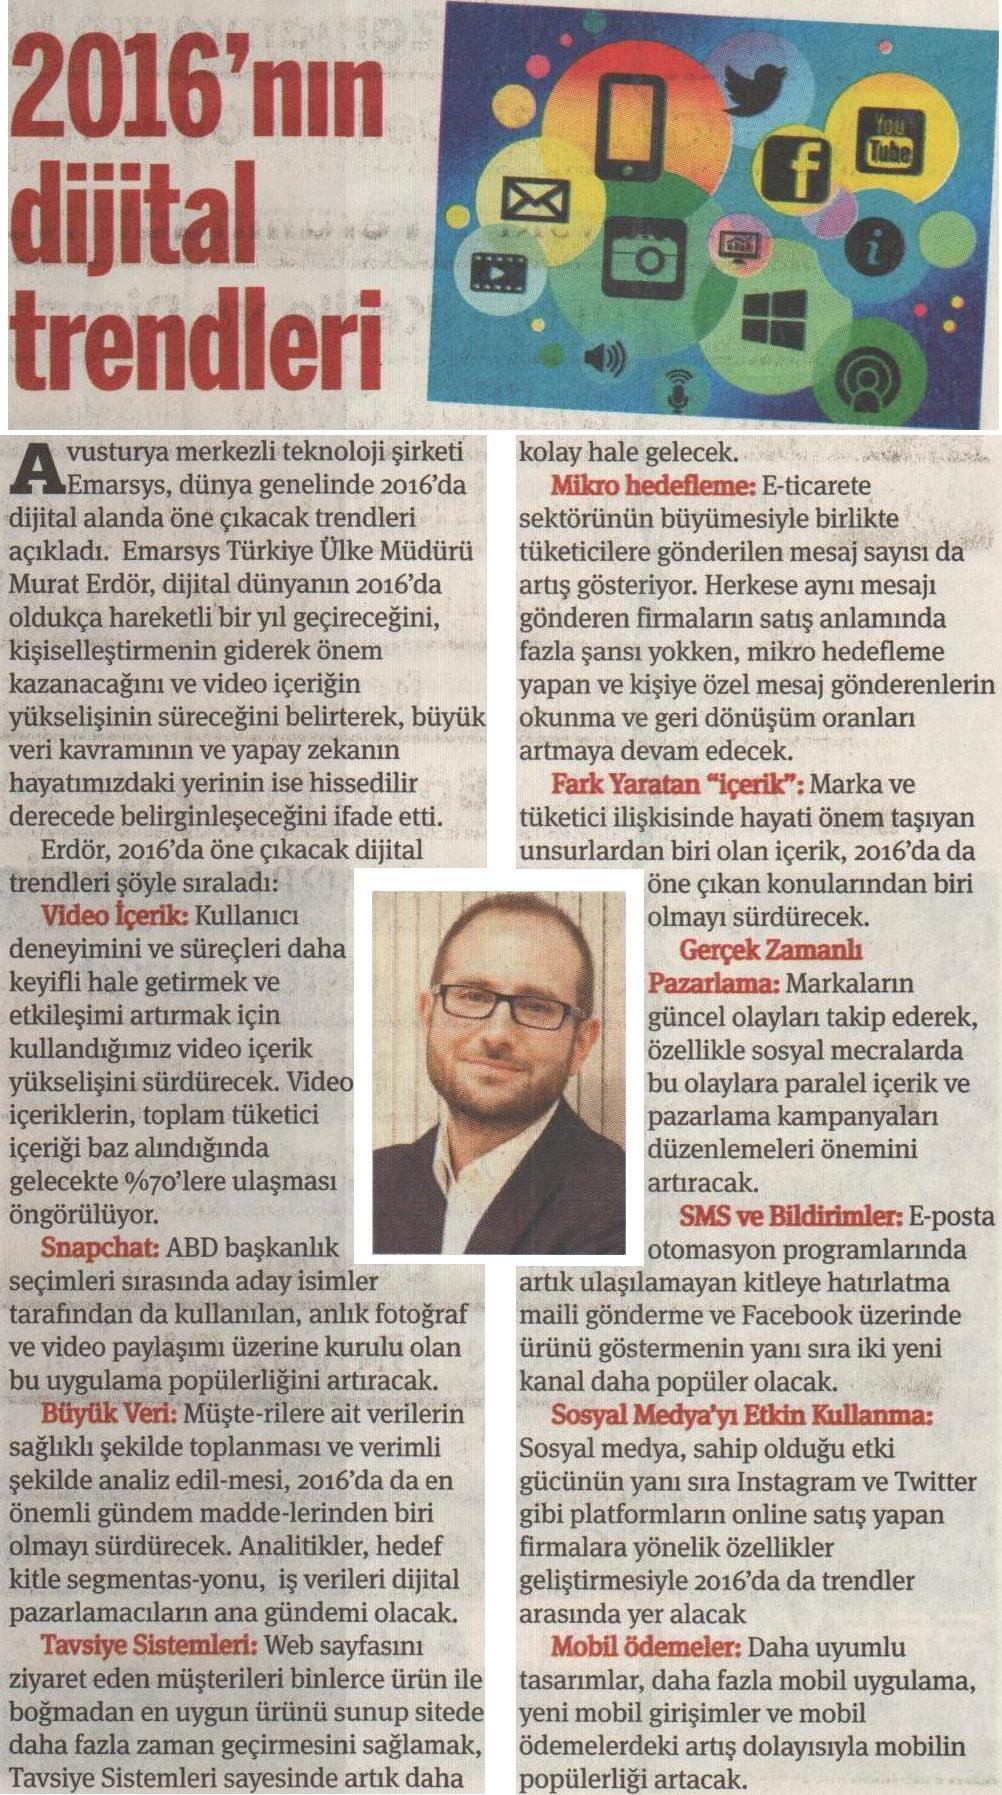 6 - Taraf Gazetesi_muraterdor.com_14.12.2015